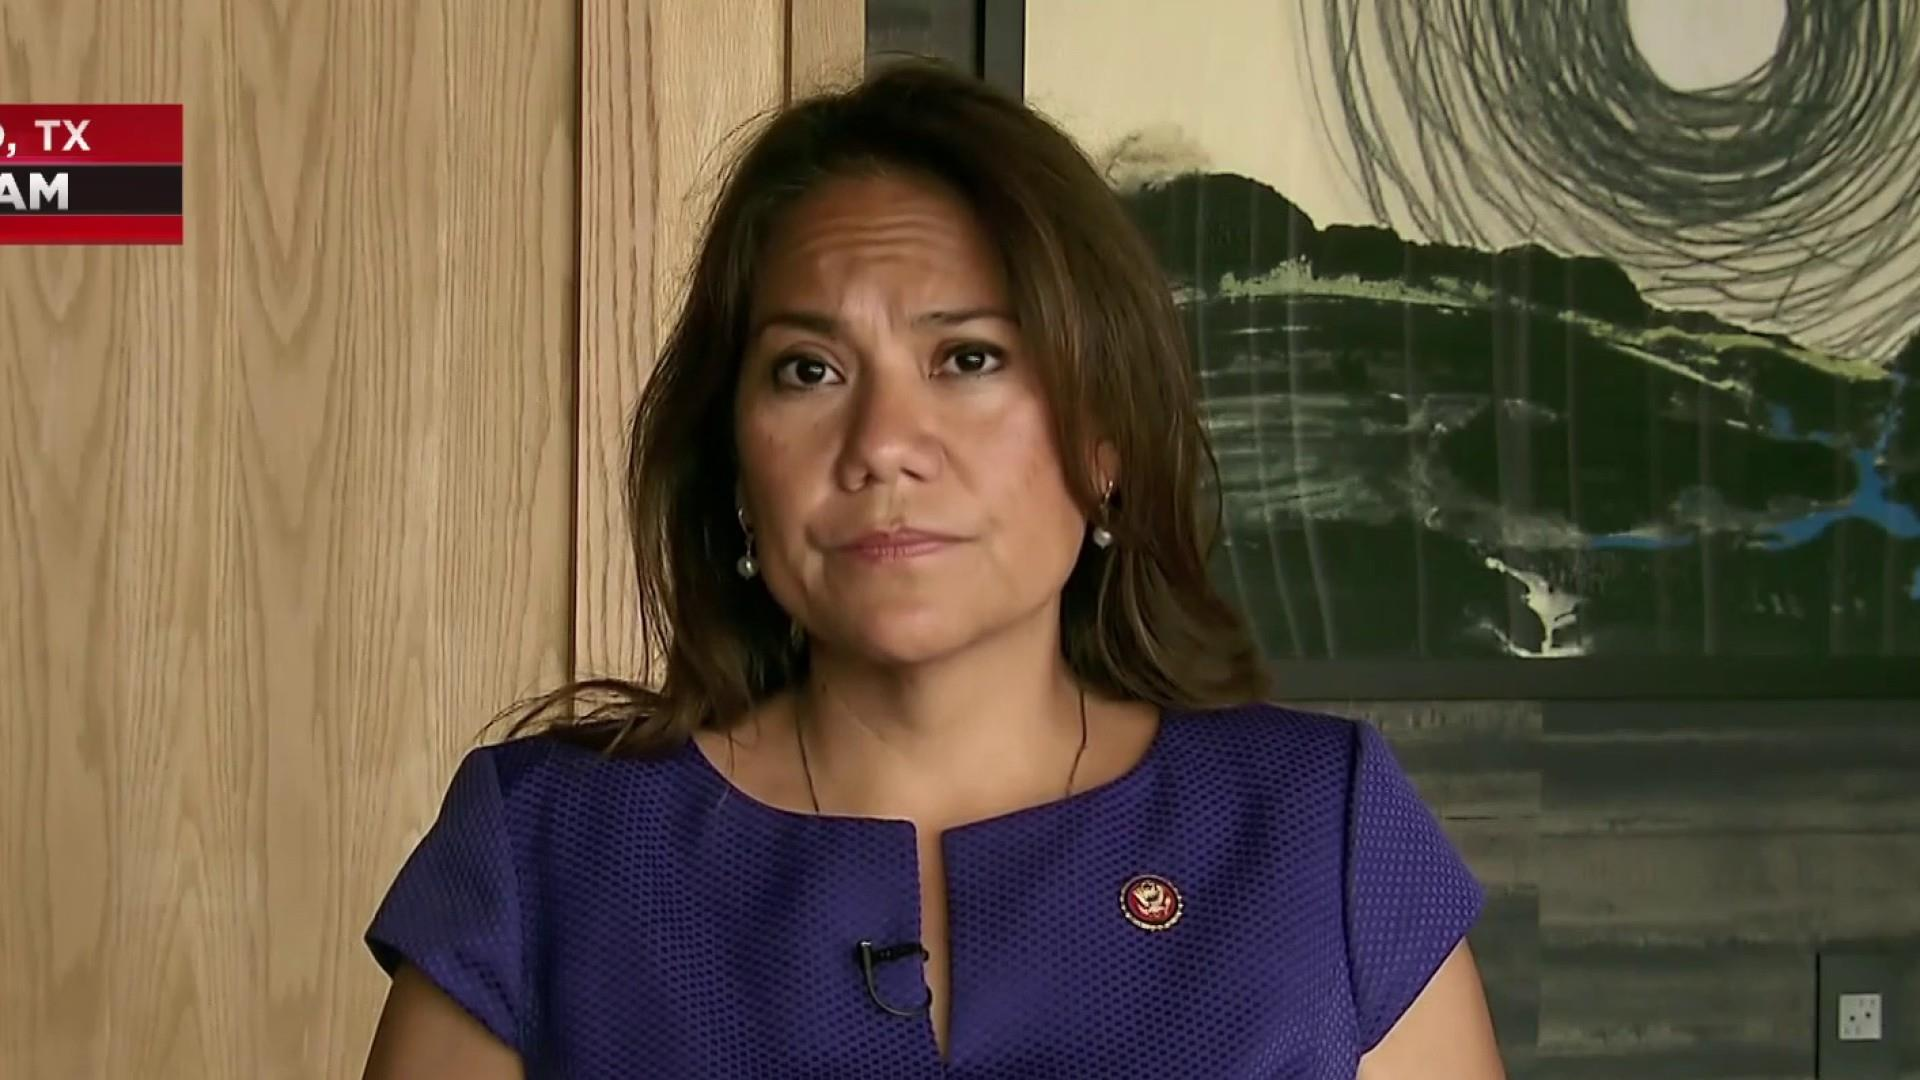 Texas Rep. Victoria Escobar: We are a resilient region